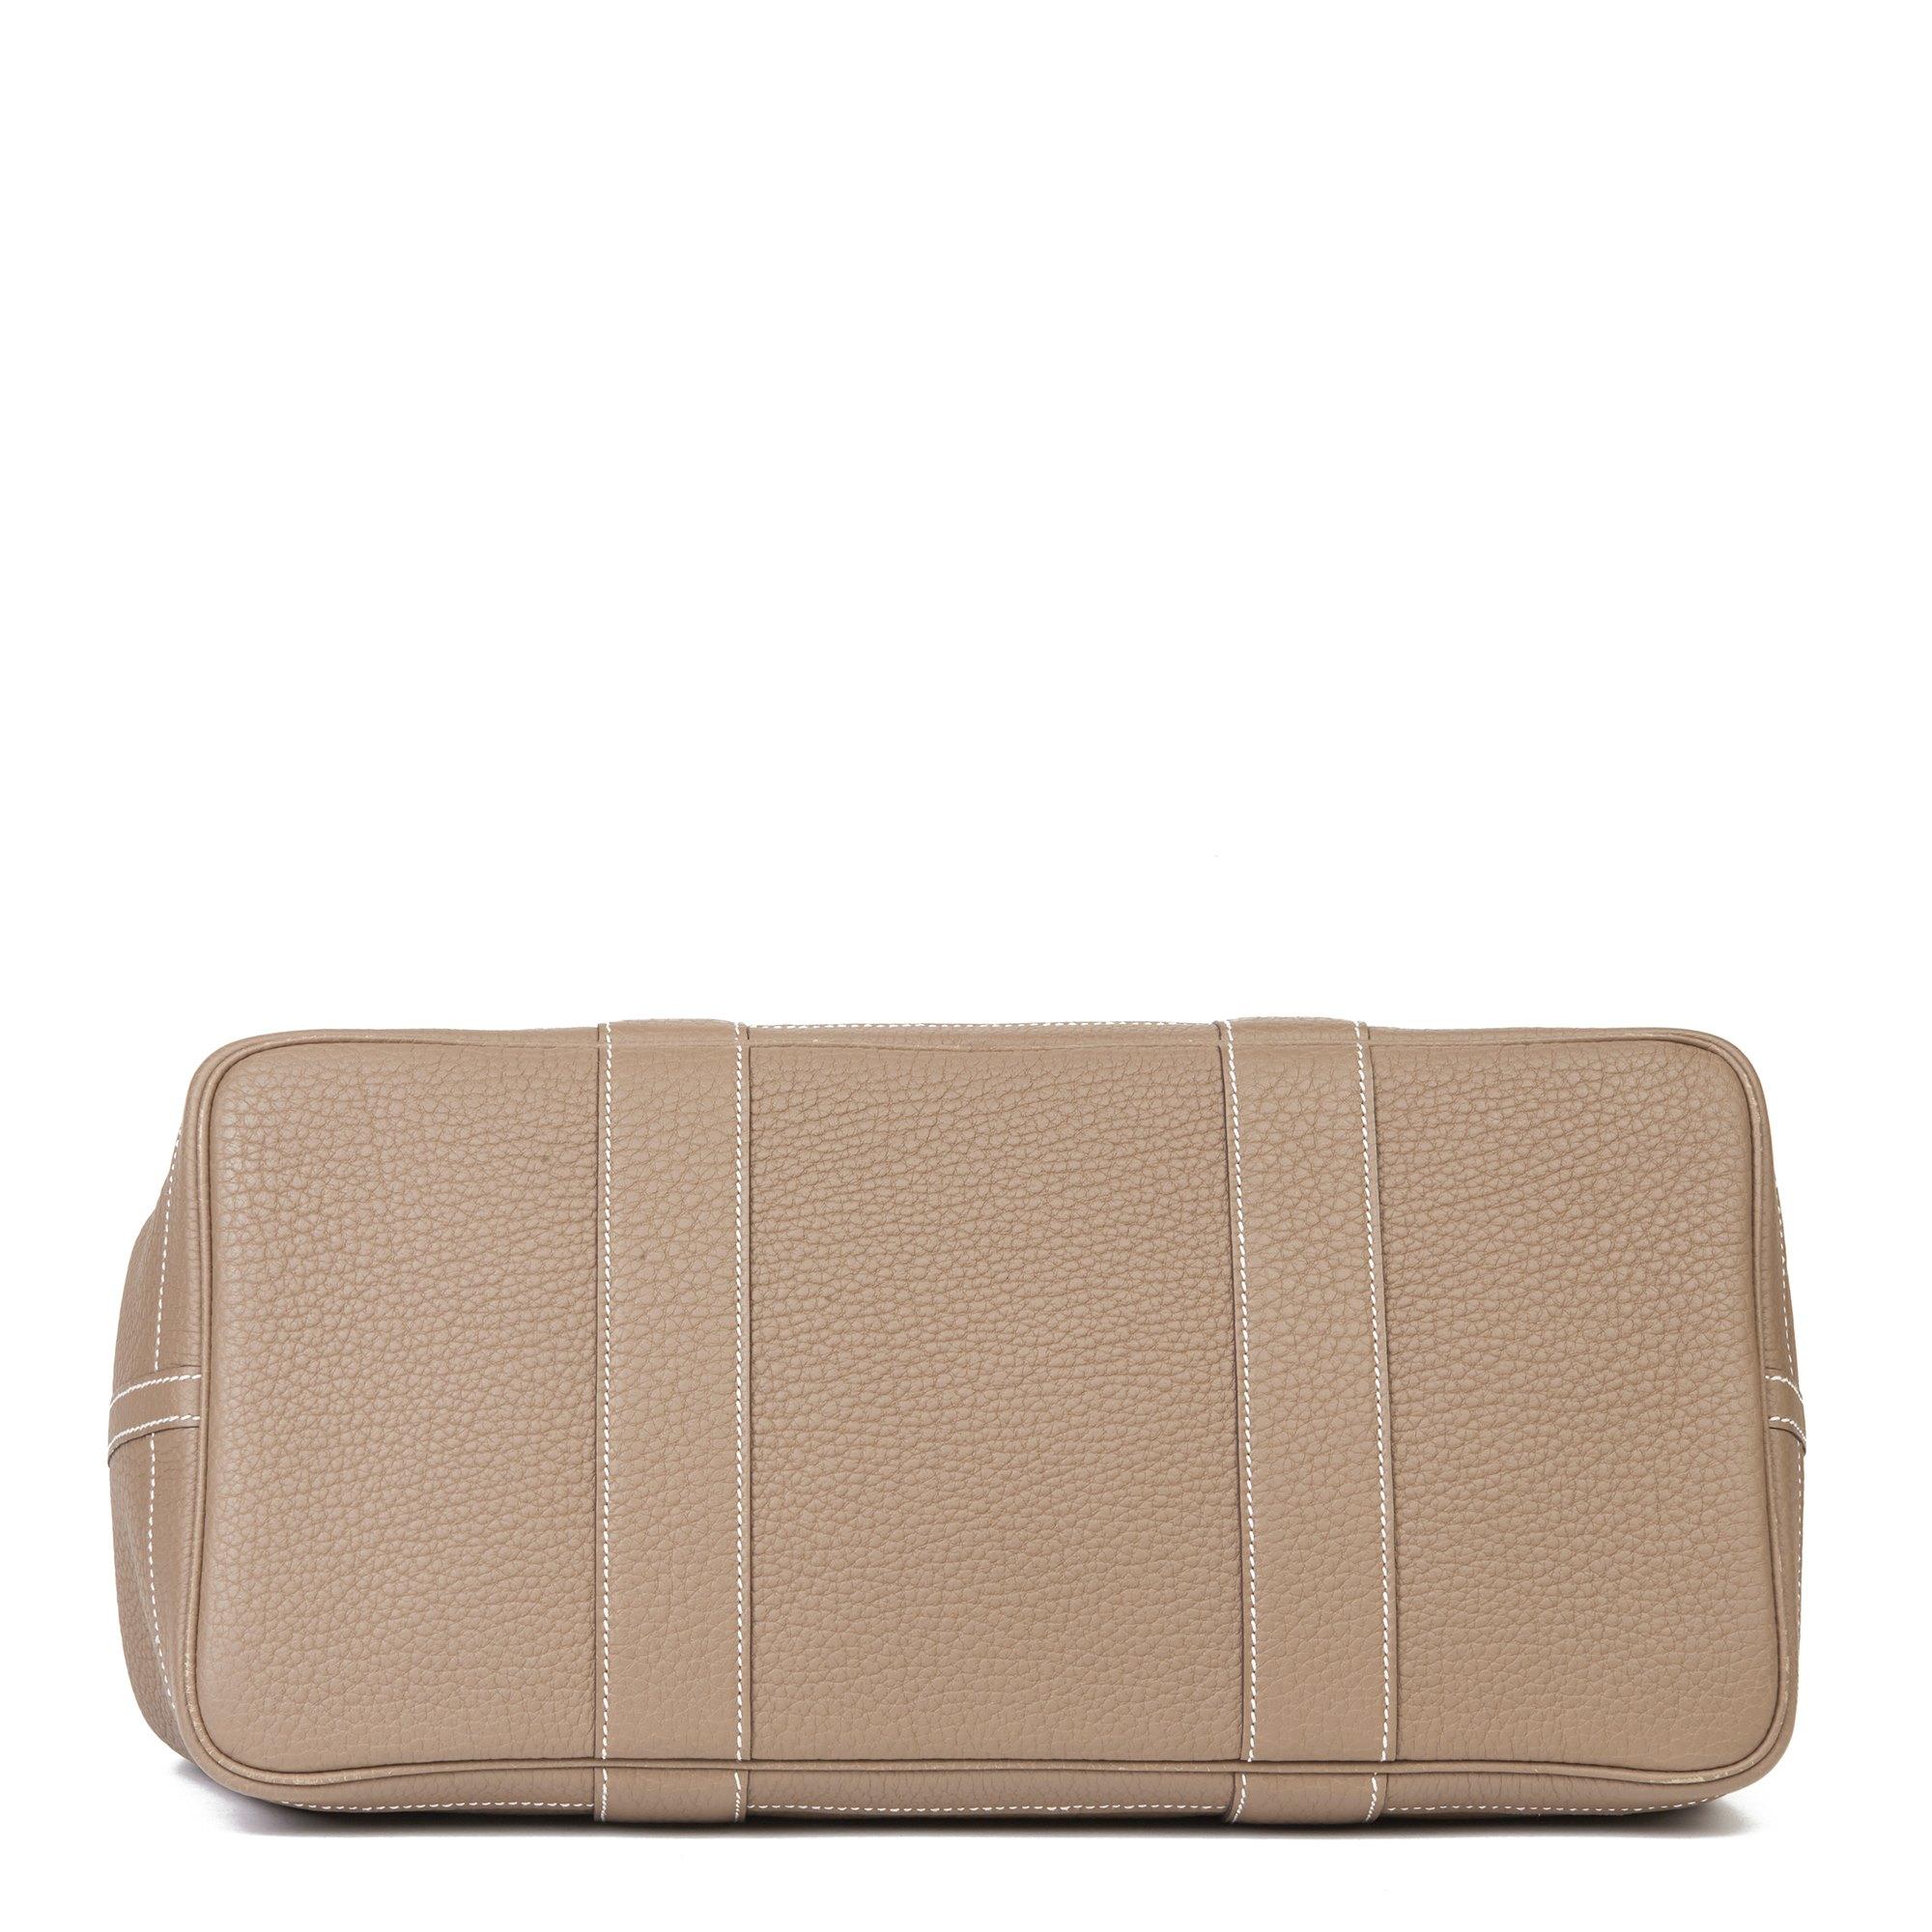 Hermès Etoupe Negonda Leather Garden Party 36cm